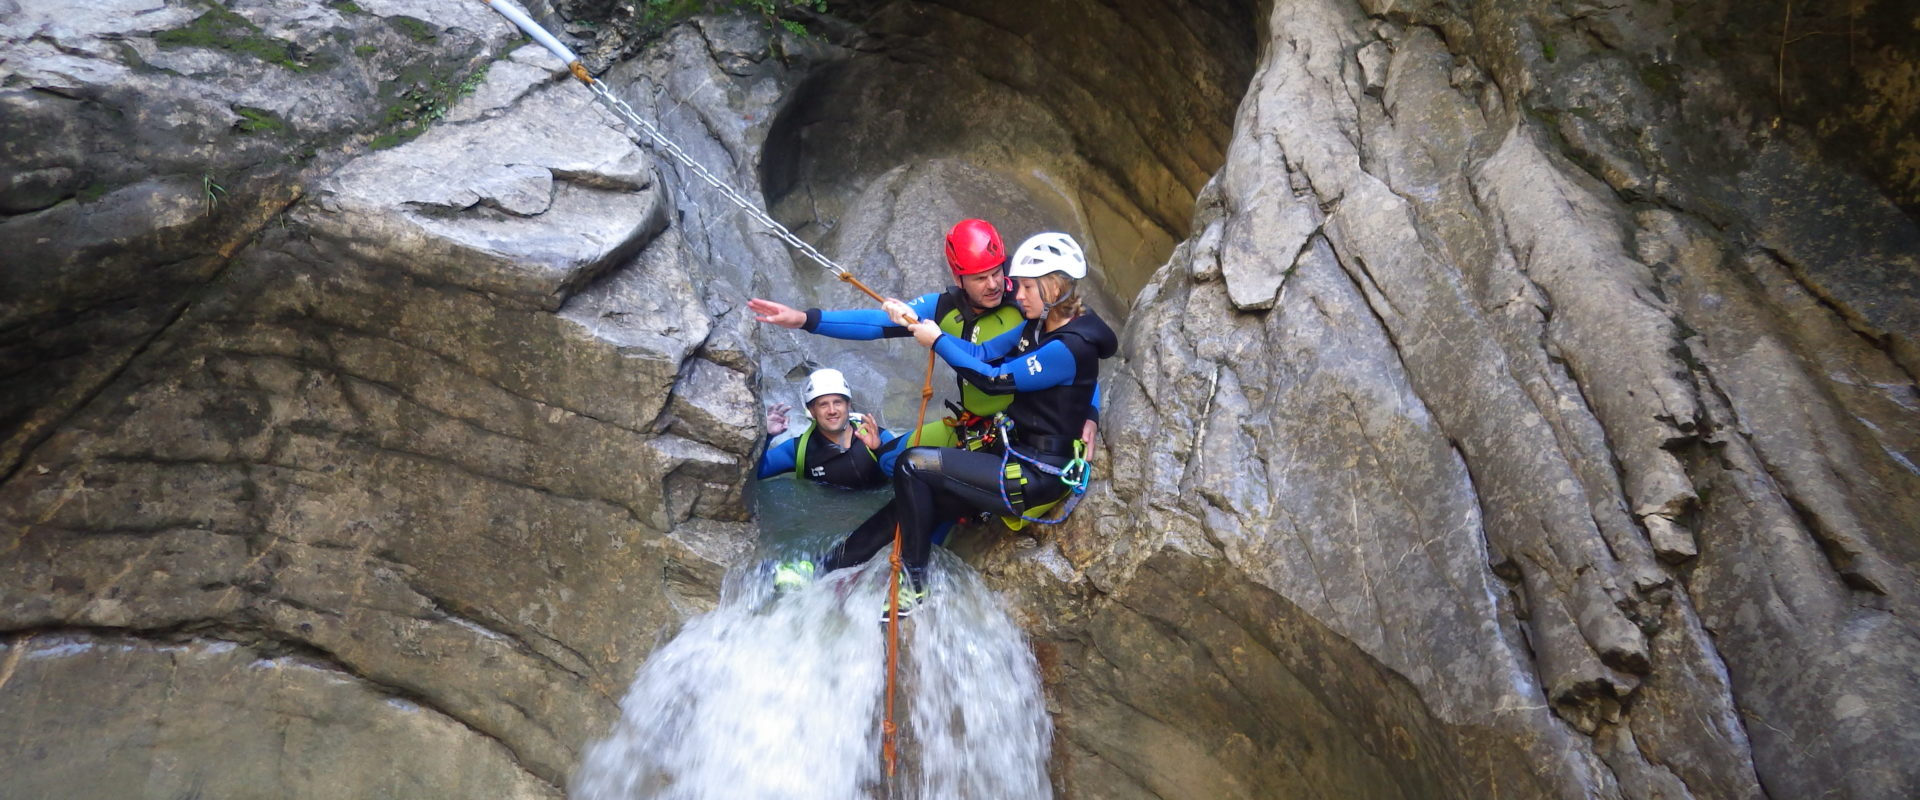 Canyoning © Jürgen Riegger - Alpine-Passion (11)